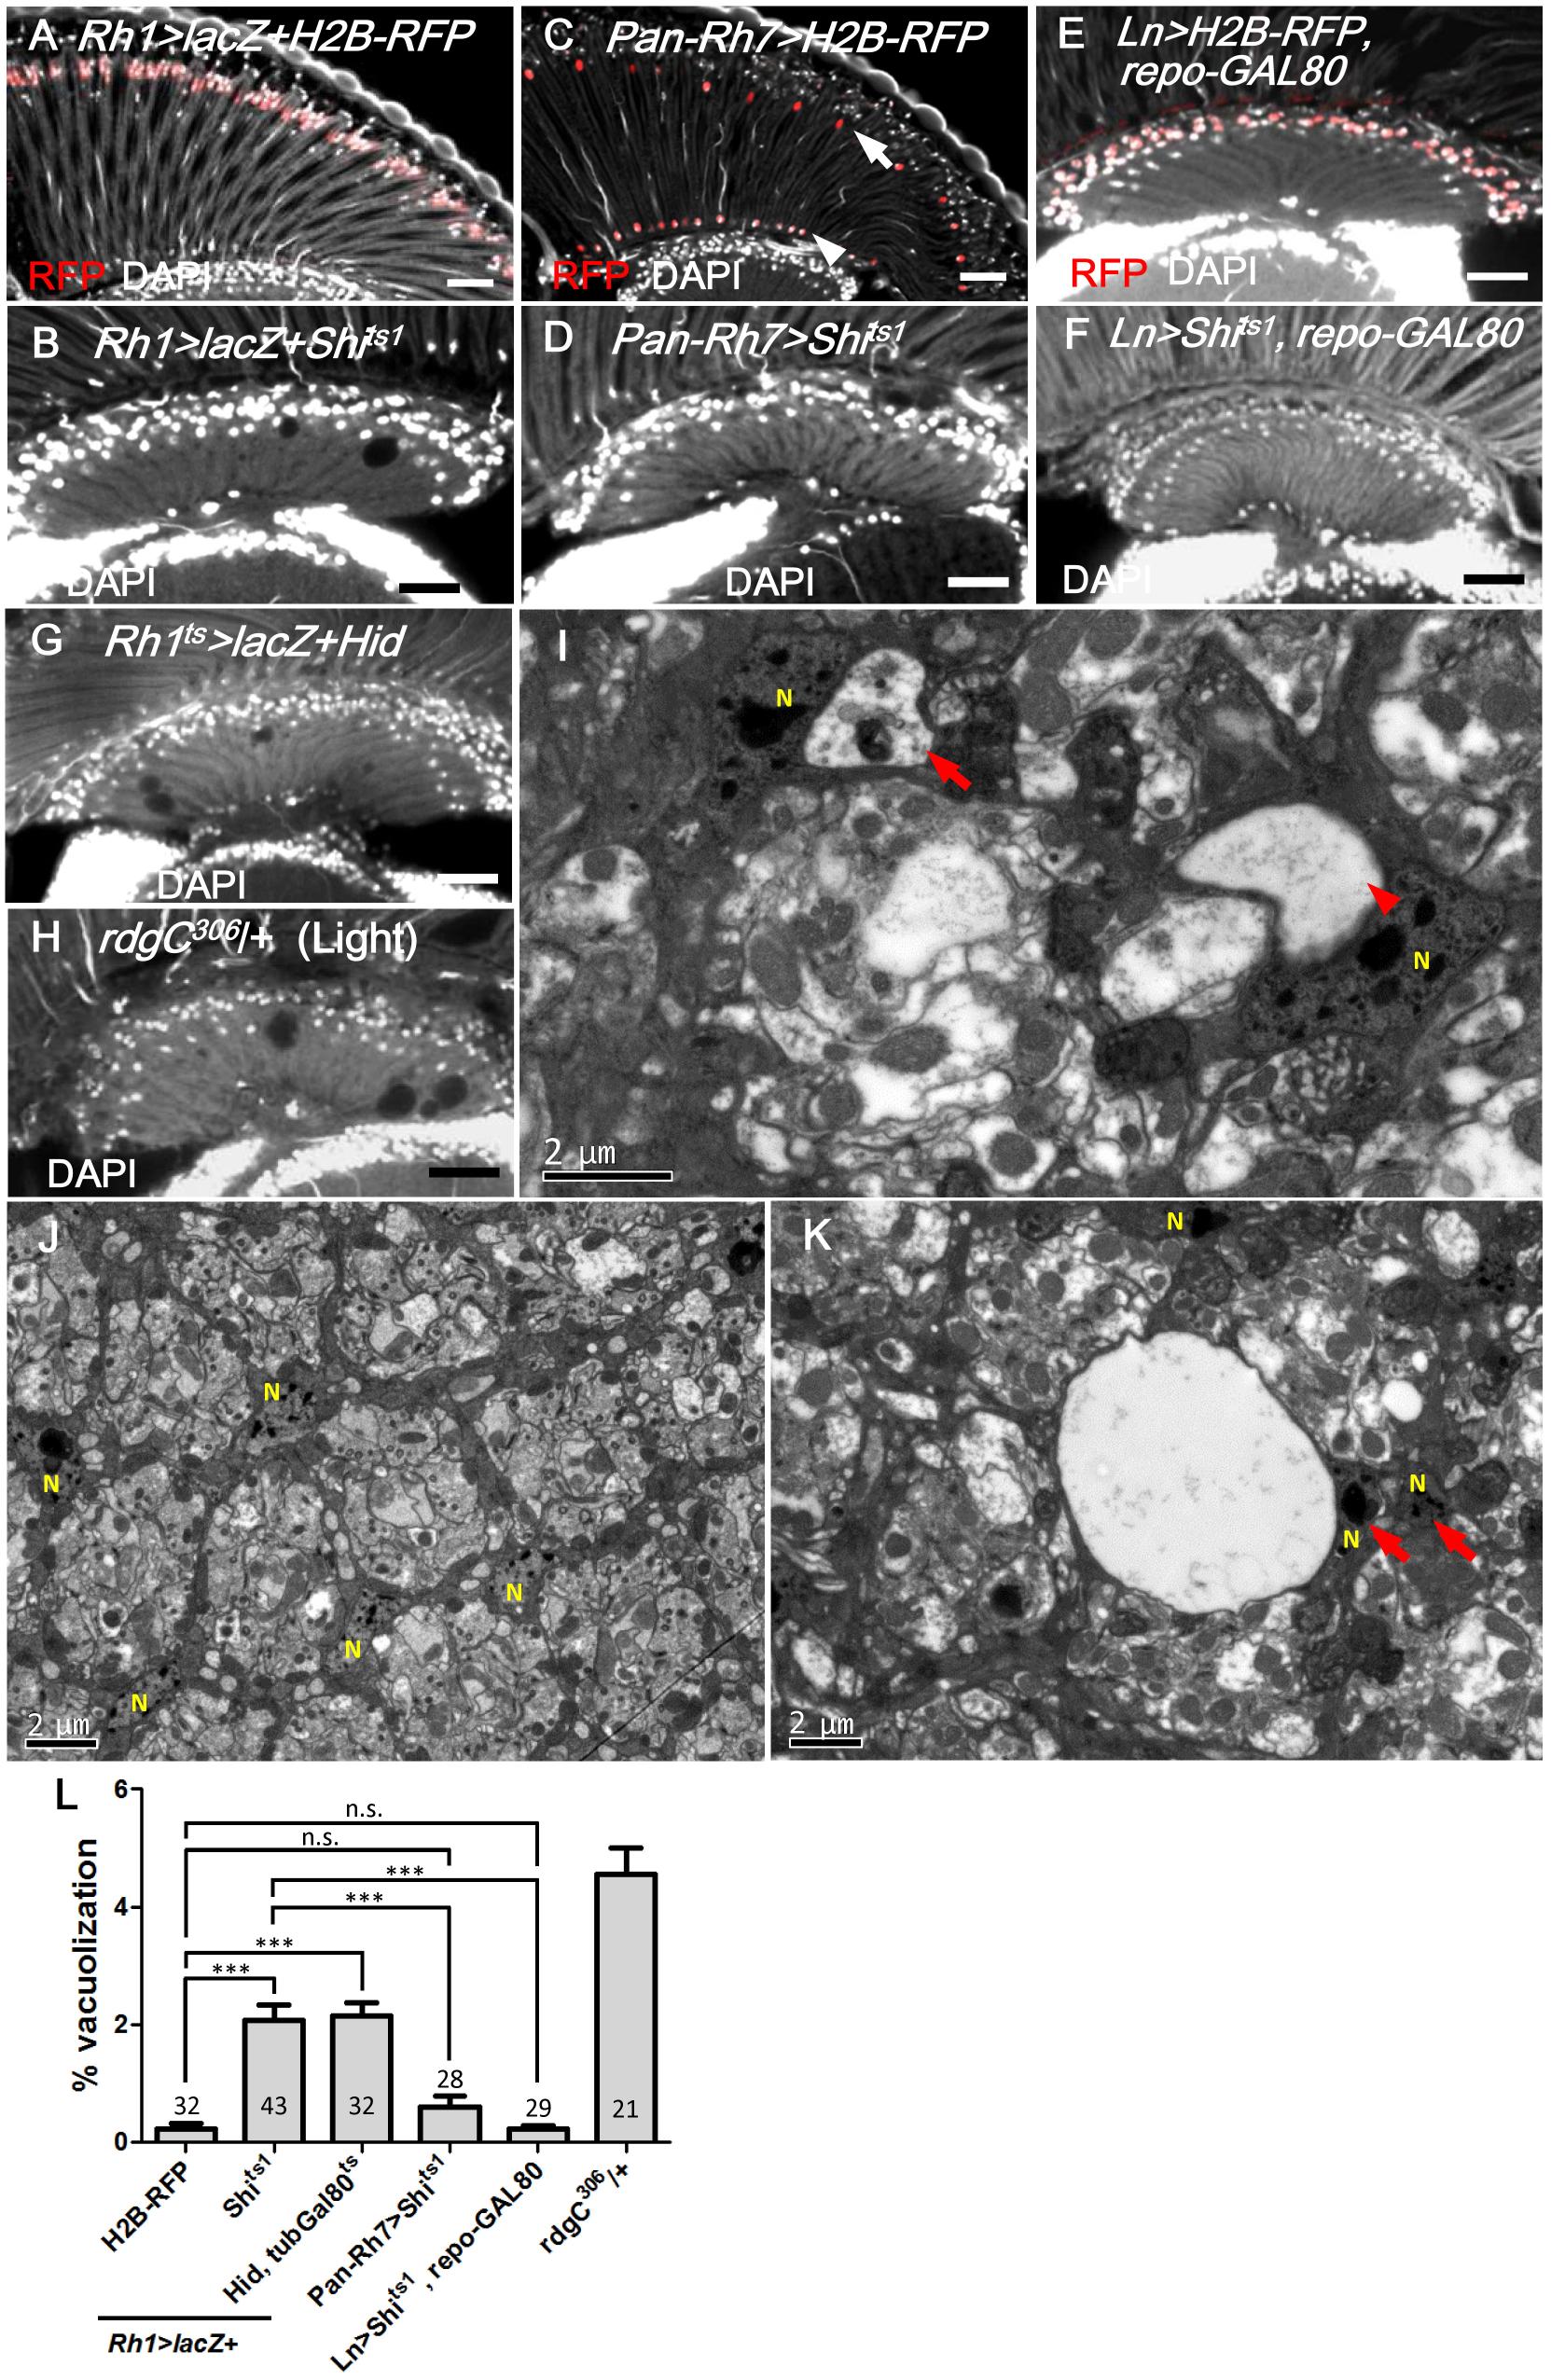 R1-6 photoreceptors are required for lamina glia maintenance.